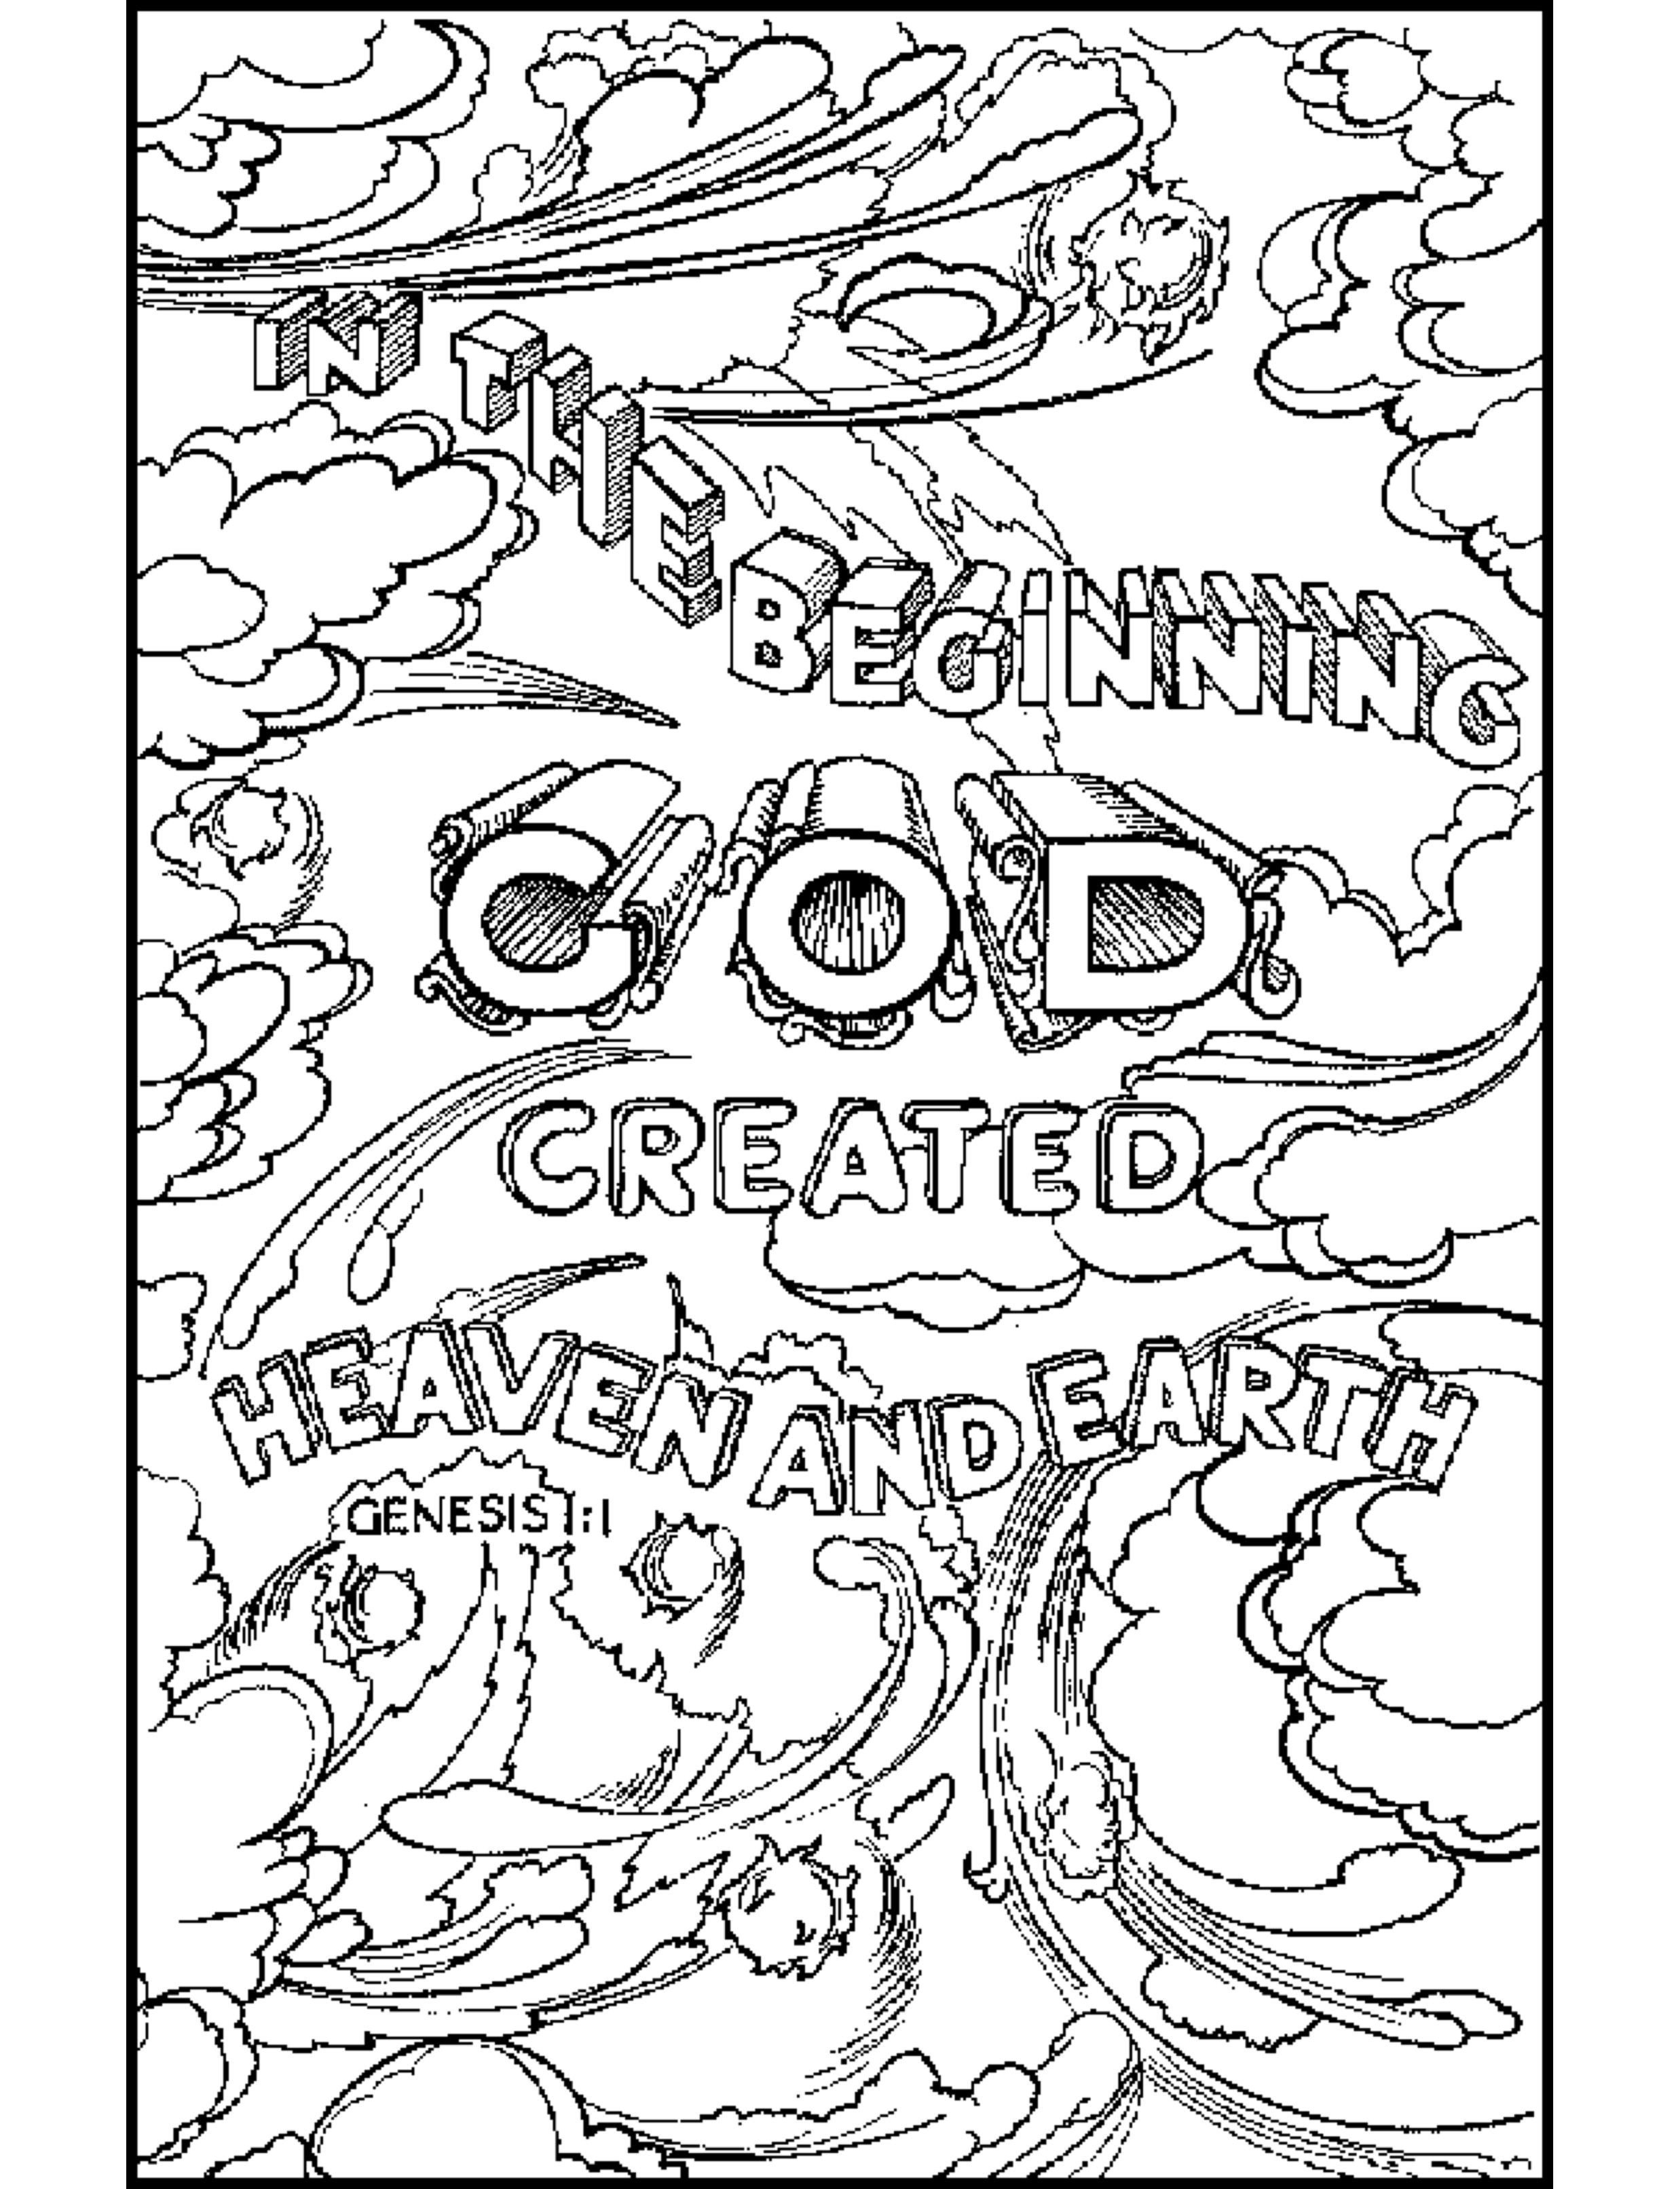 Coloring Book World ~ Christian Coloring Sheets Top Free Printable - Free Printable Bible Verses Adults